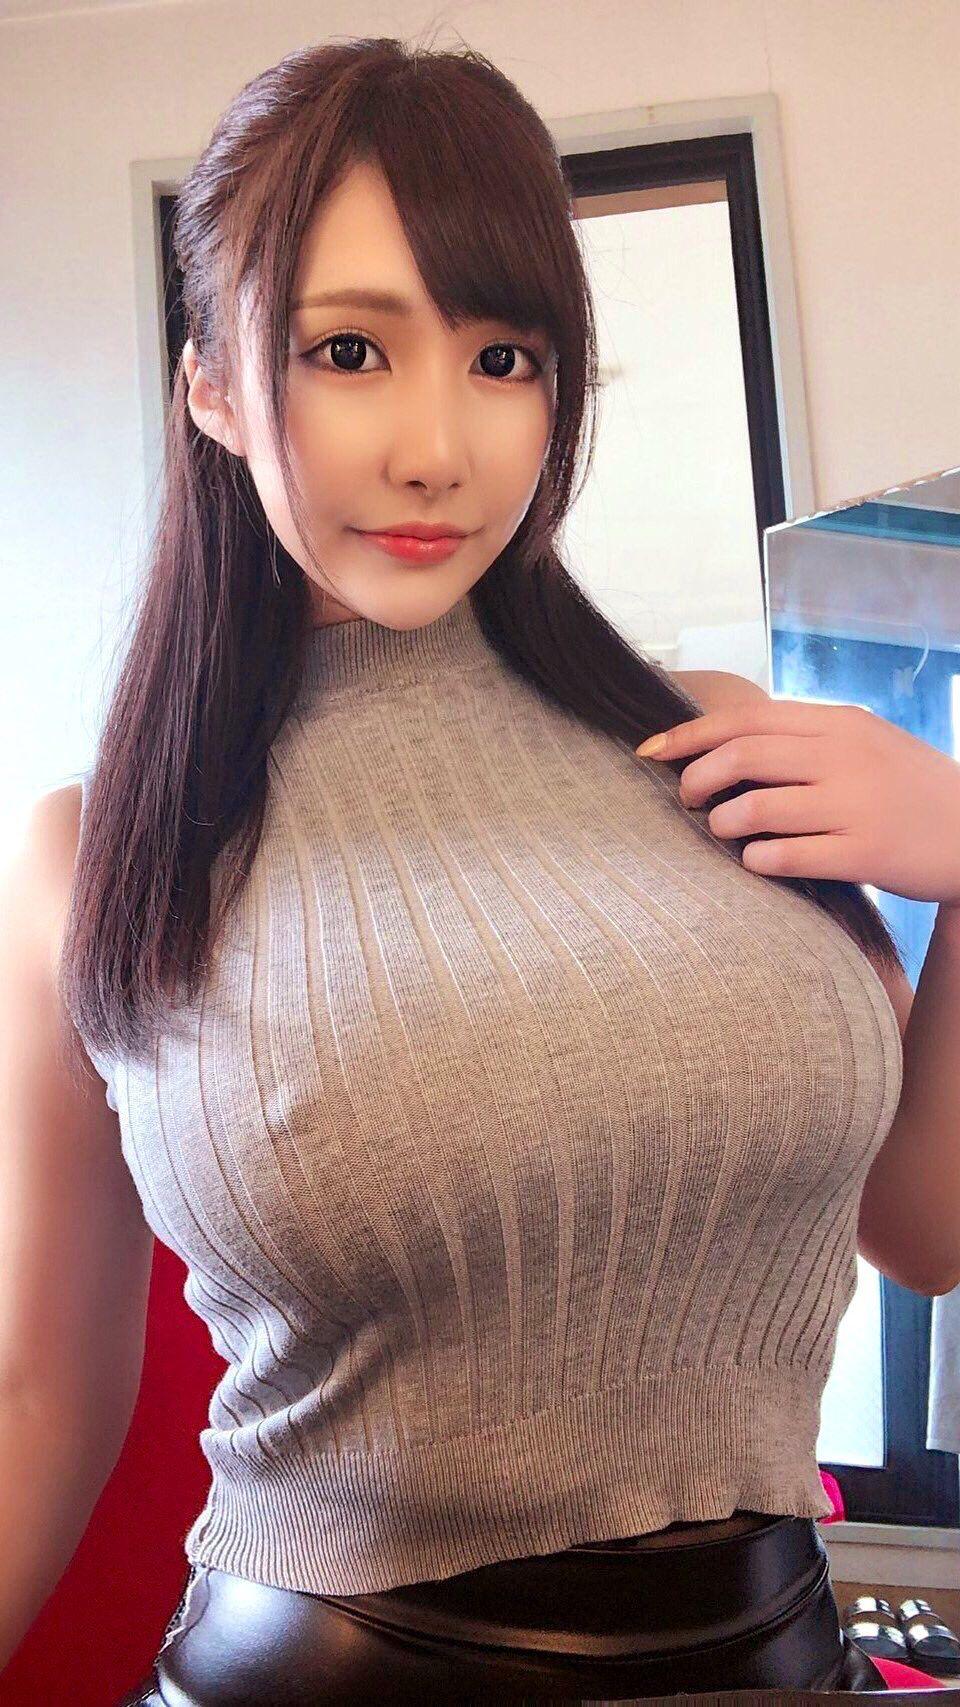 Asian Babes DB » Suzuka Ishikawa Pictures